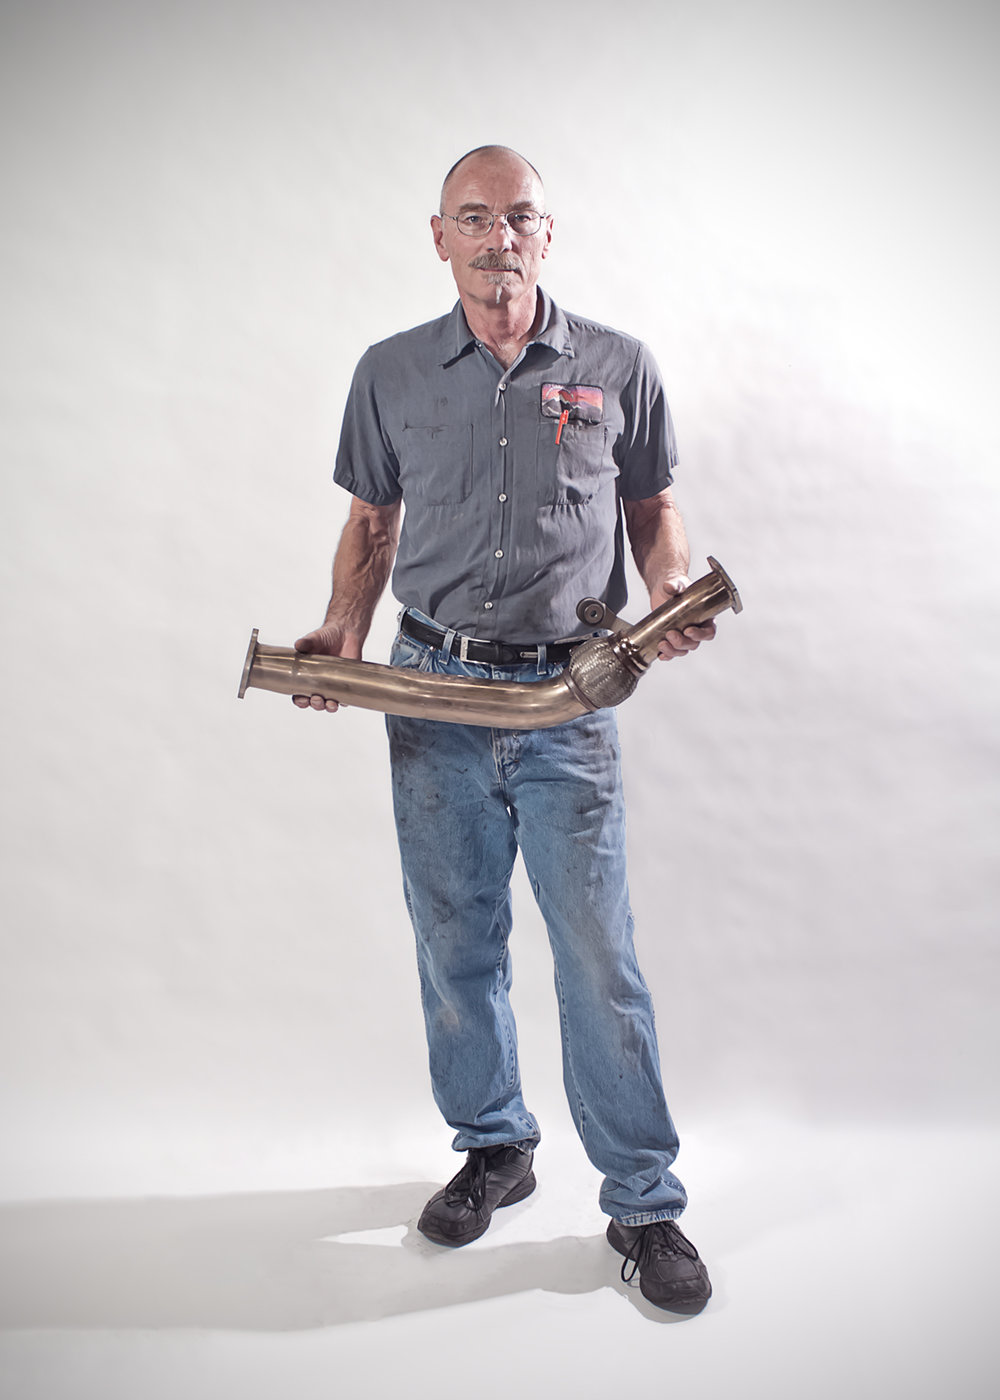 Tod  Master Auto Mechanic.